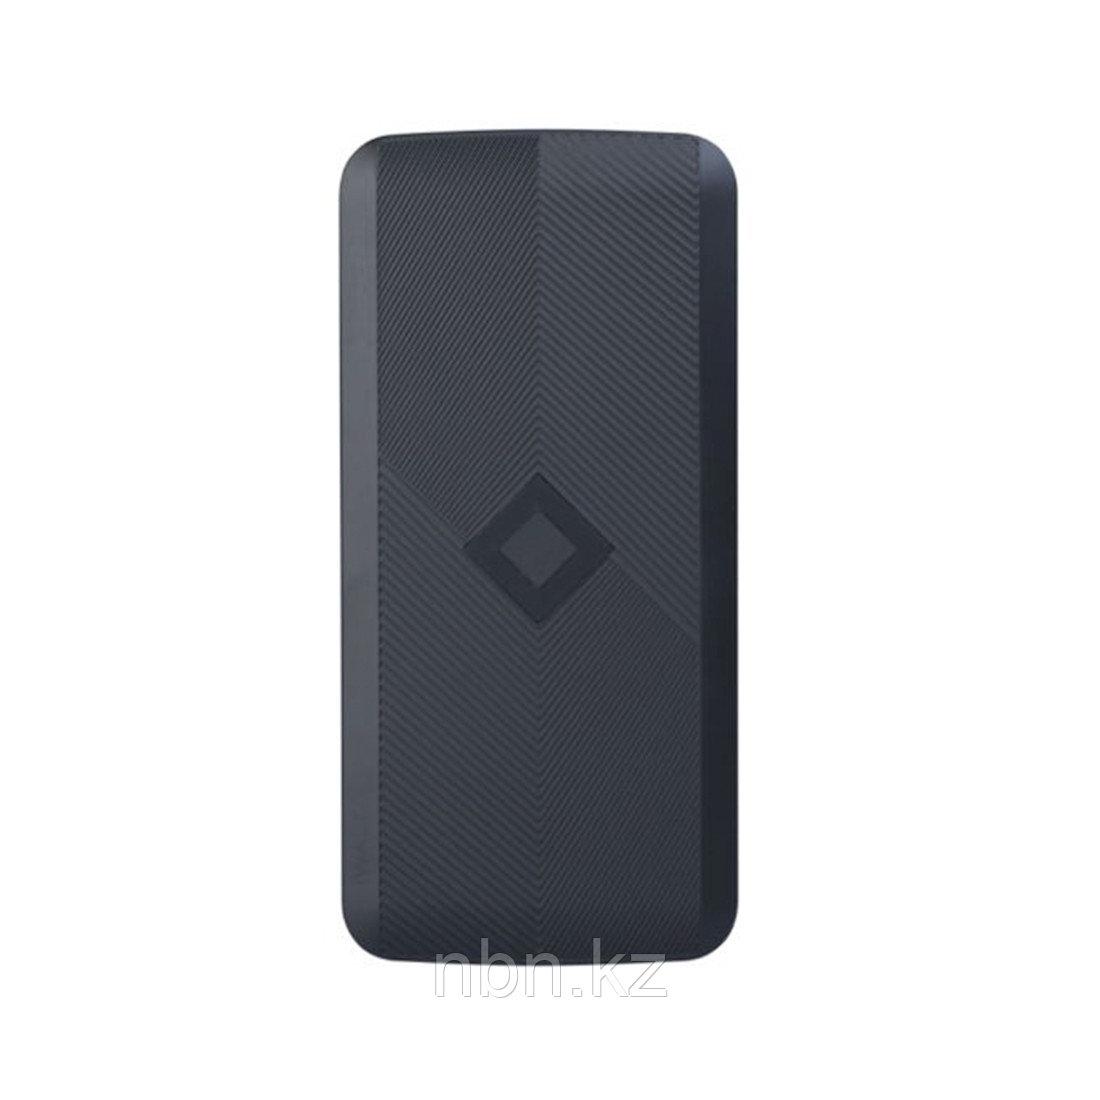 Портативное зарядное устройство iWalk UBA8000 Black